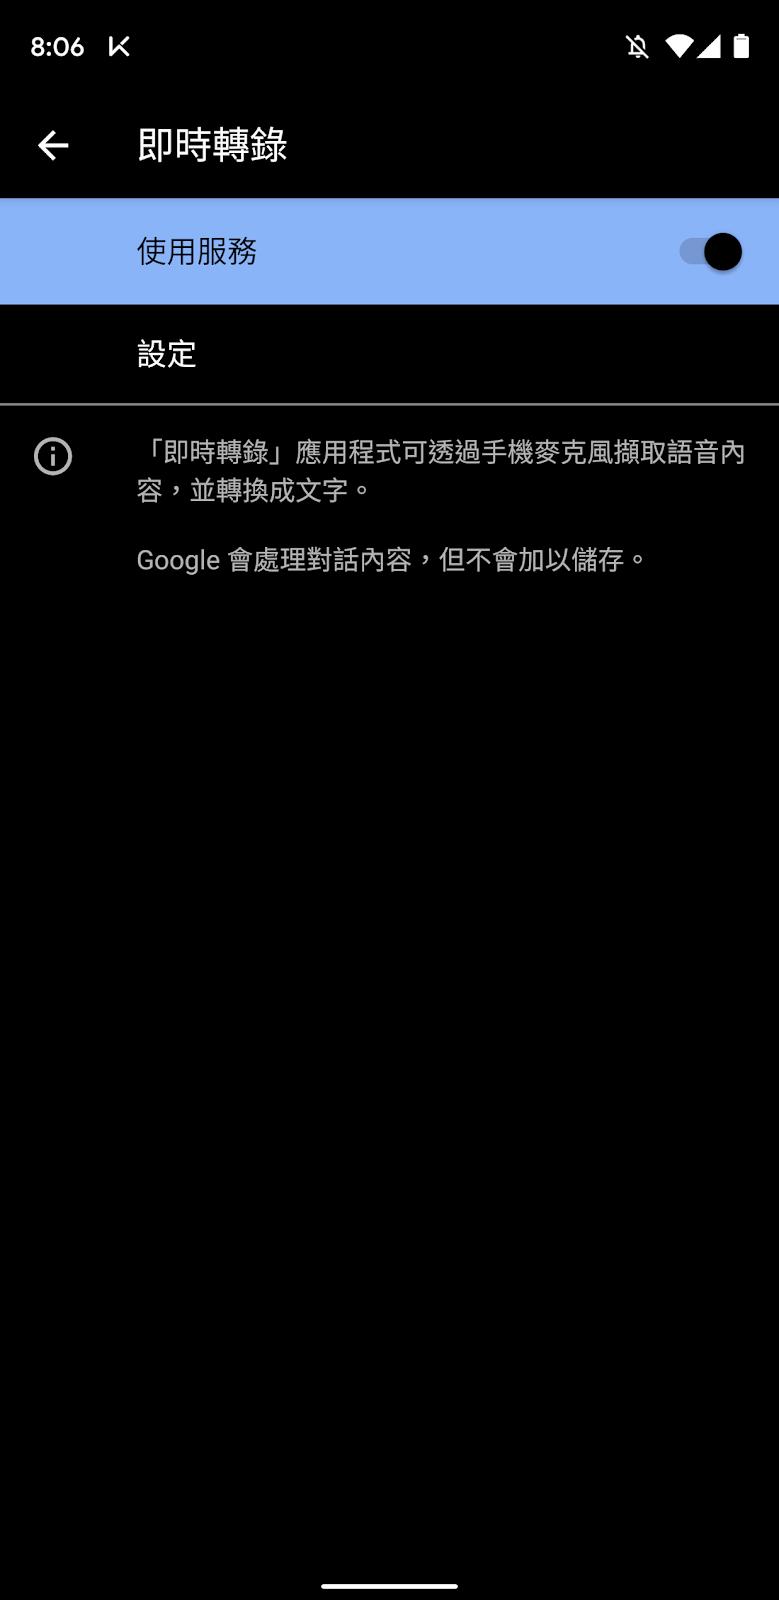 Google 即時轉錄:超準確中文語音轉文字可自動加上標點符號